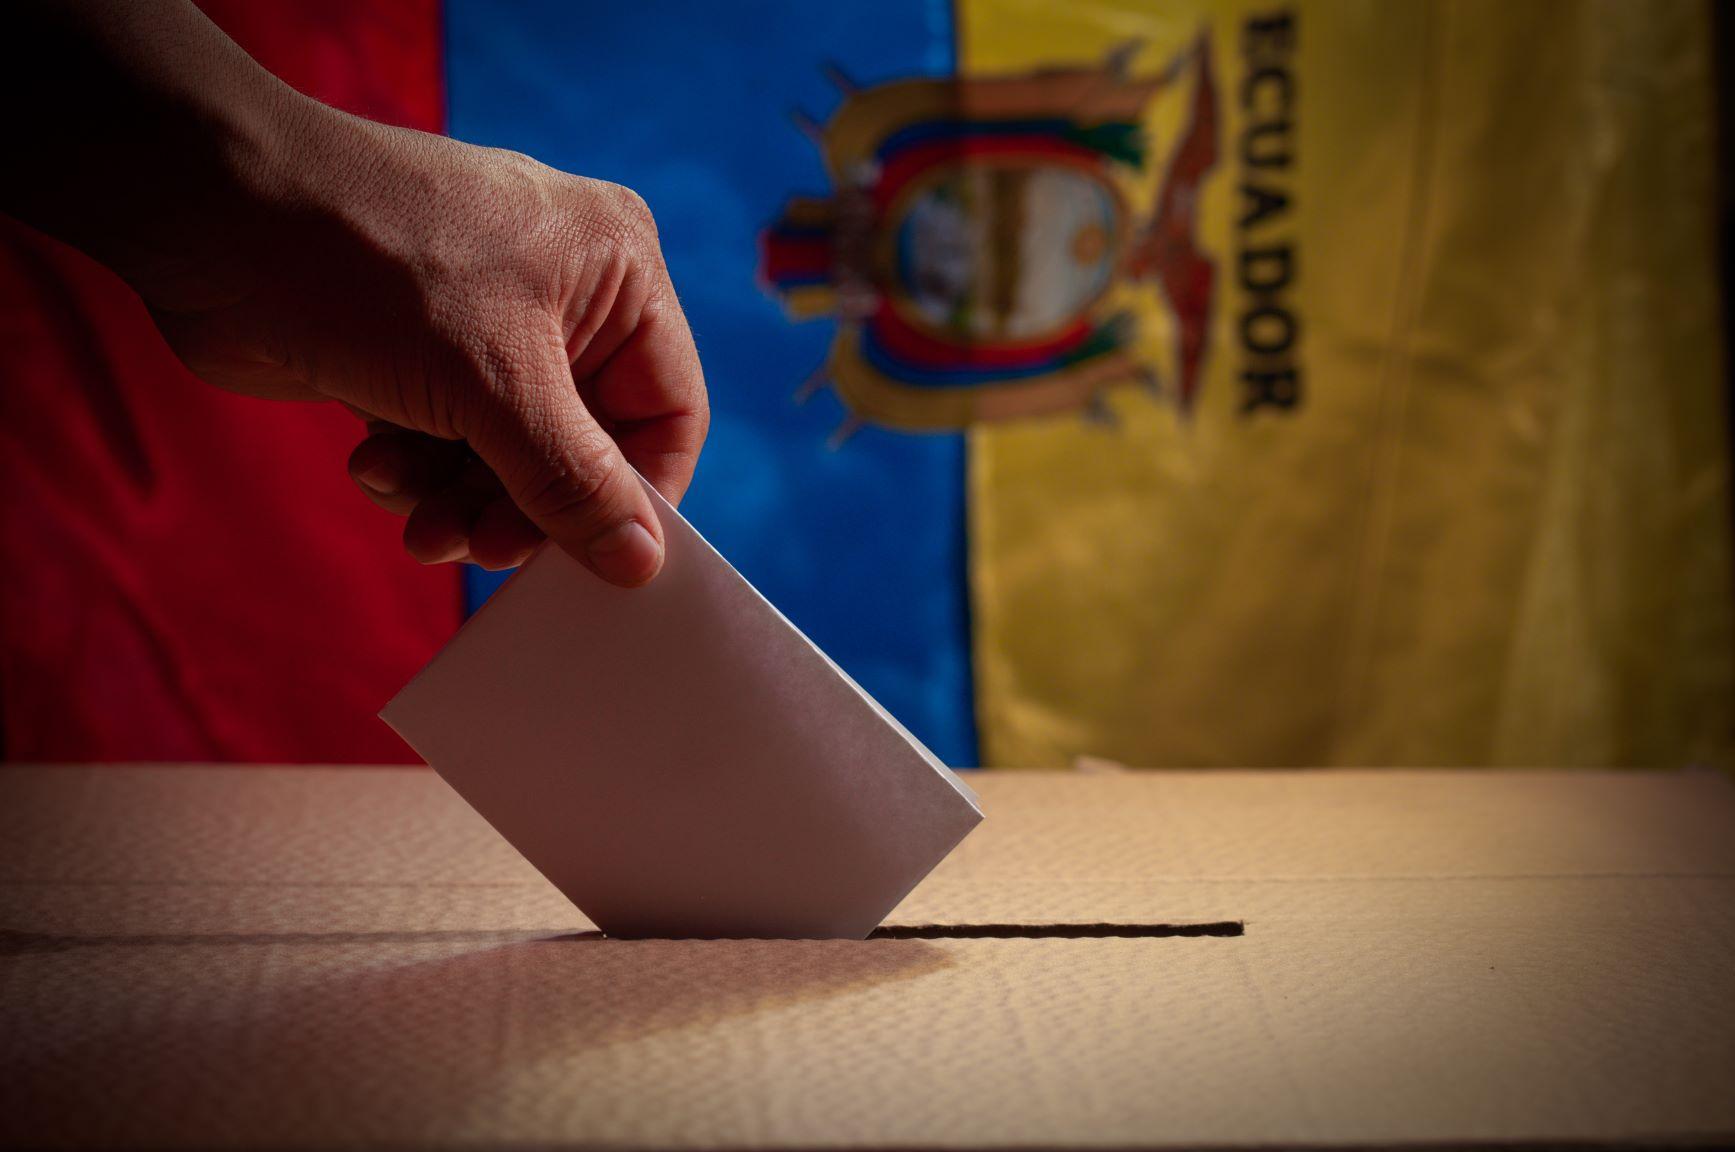 Ecuador election preview: Uncertainty set to continue